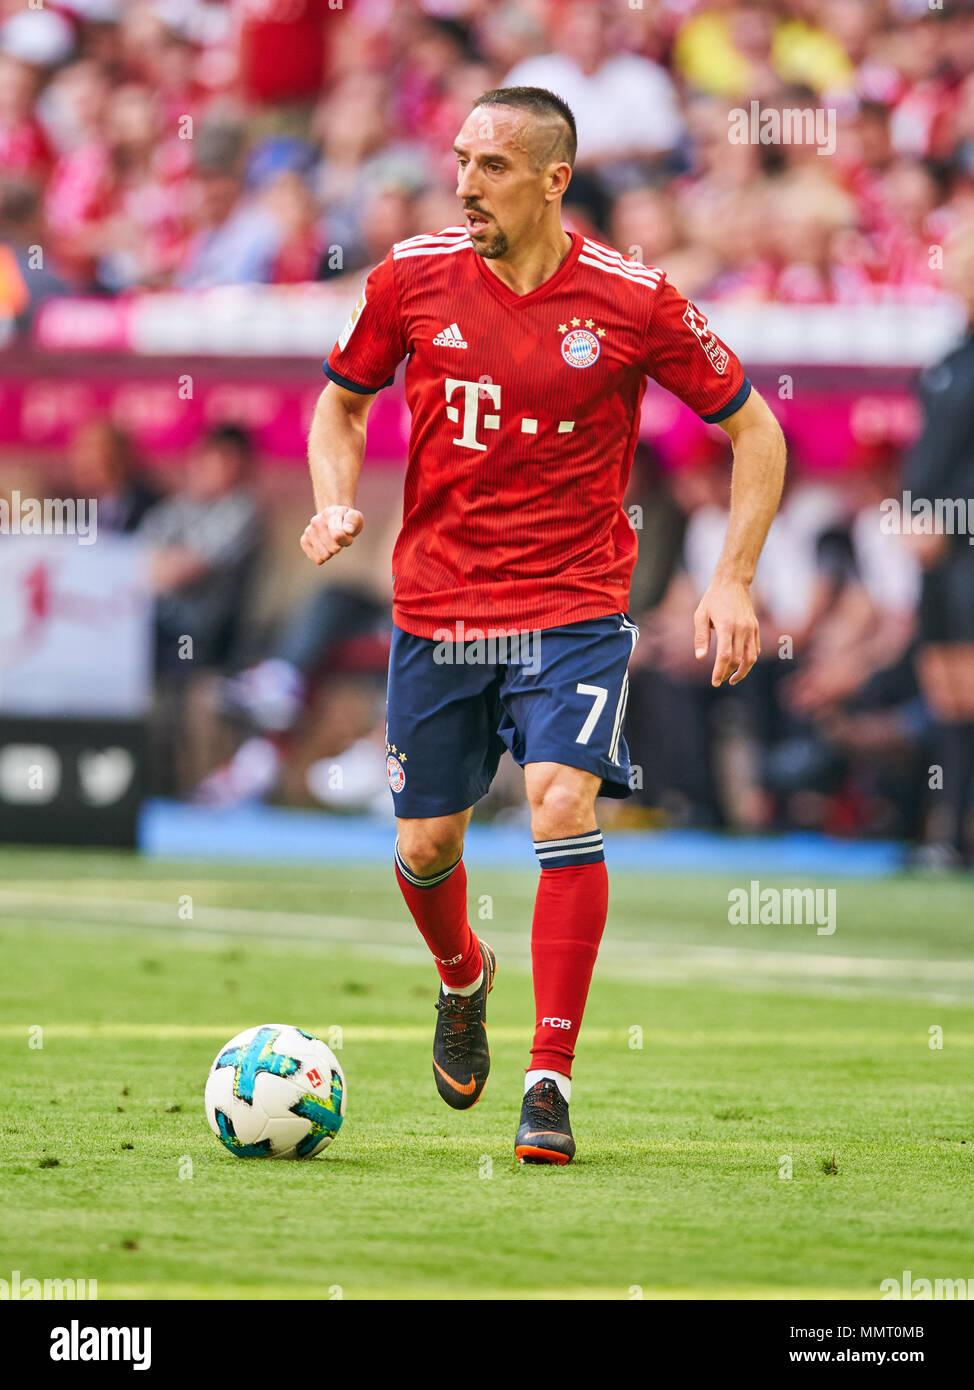 Maglia Home FC Bayern München Franck Ribéry